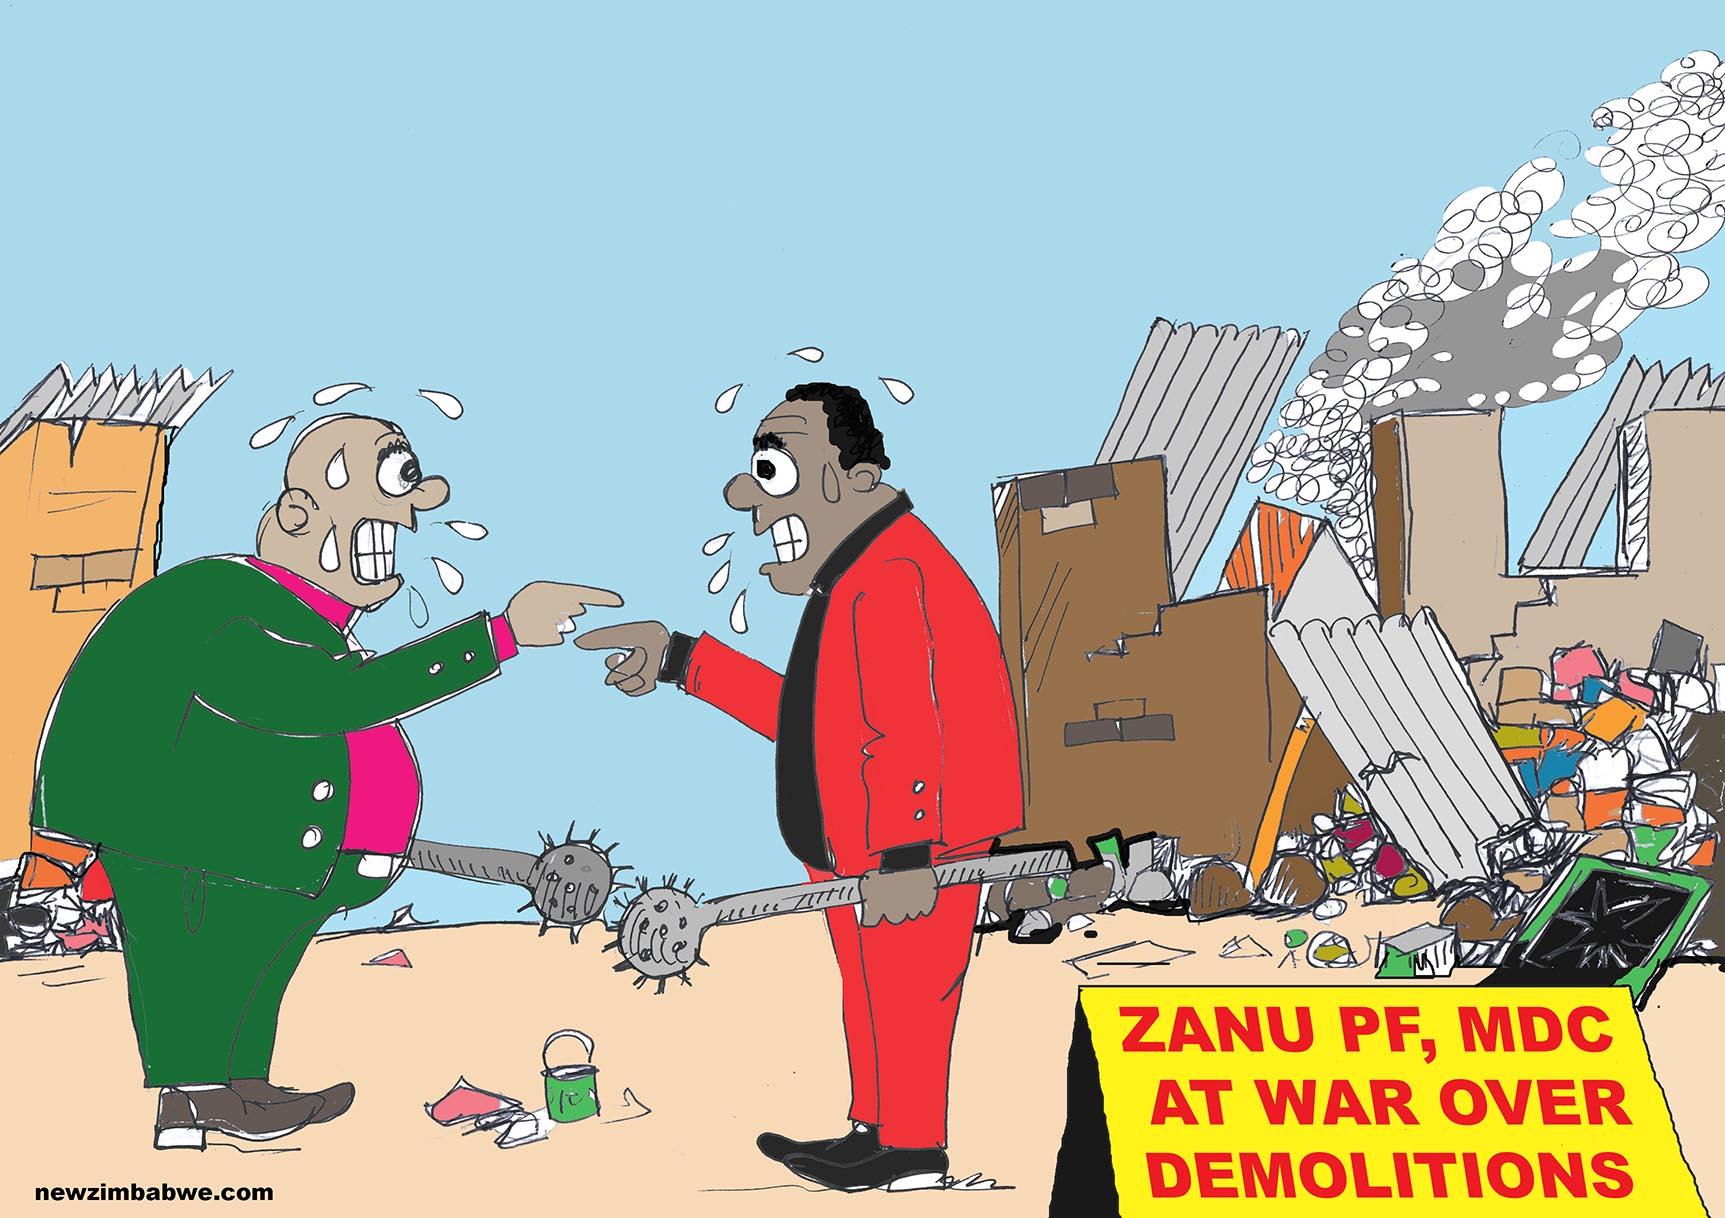 Zanu PF and MDC at war